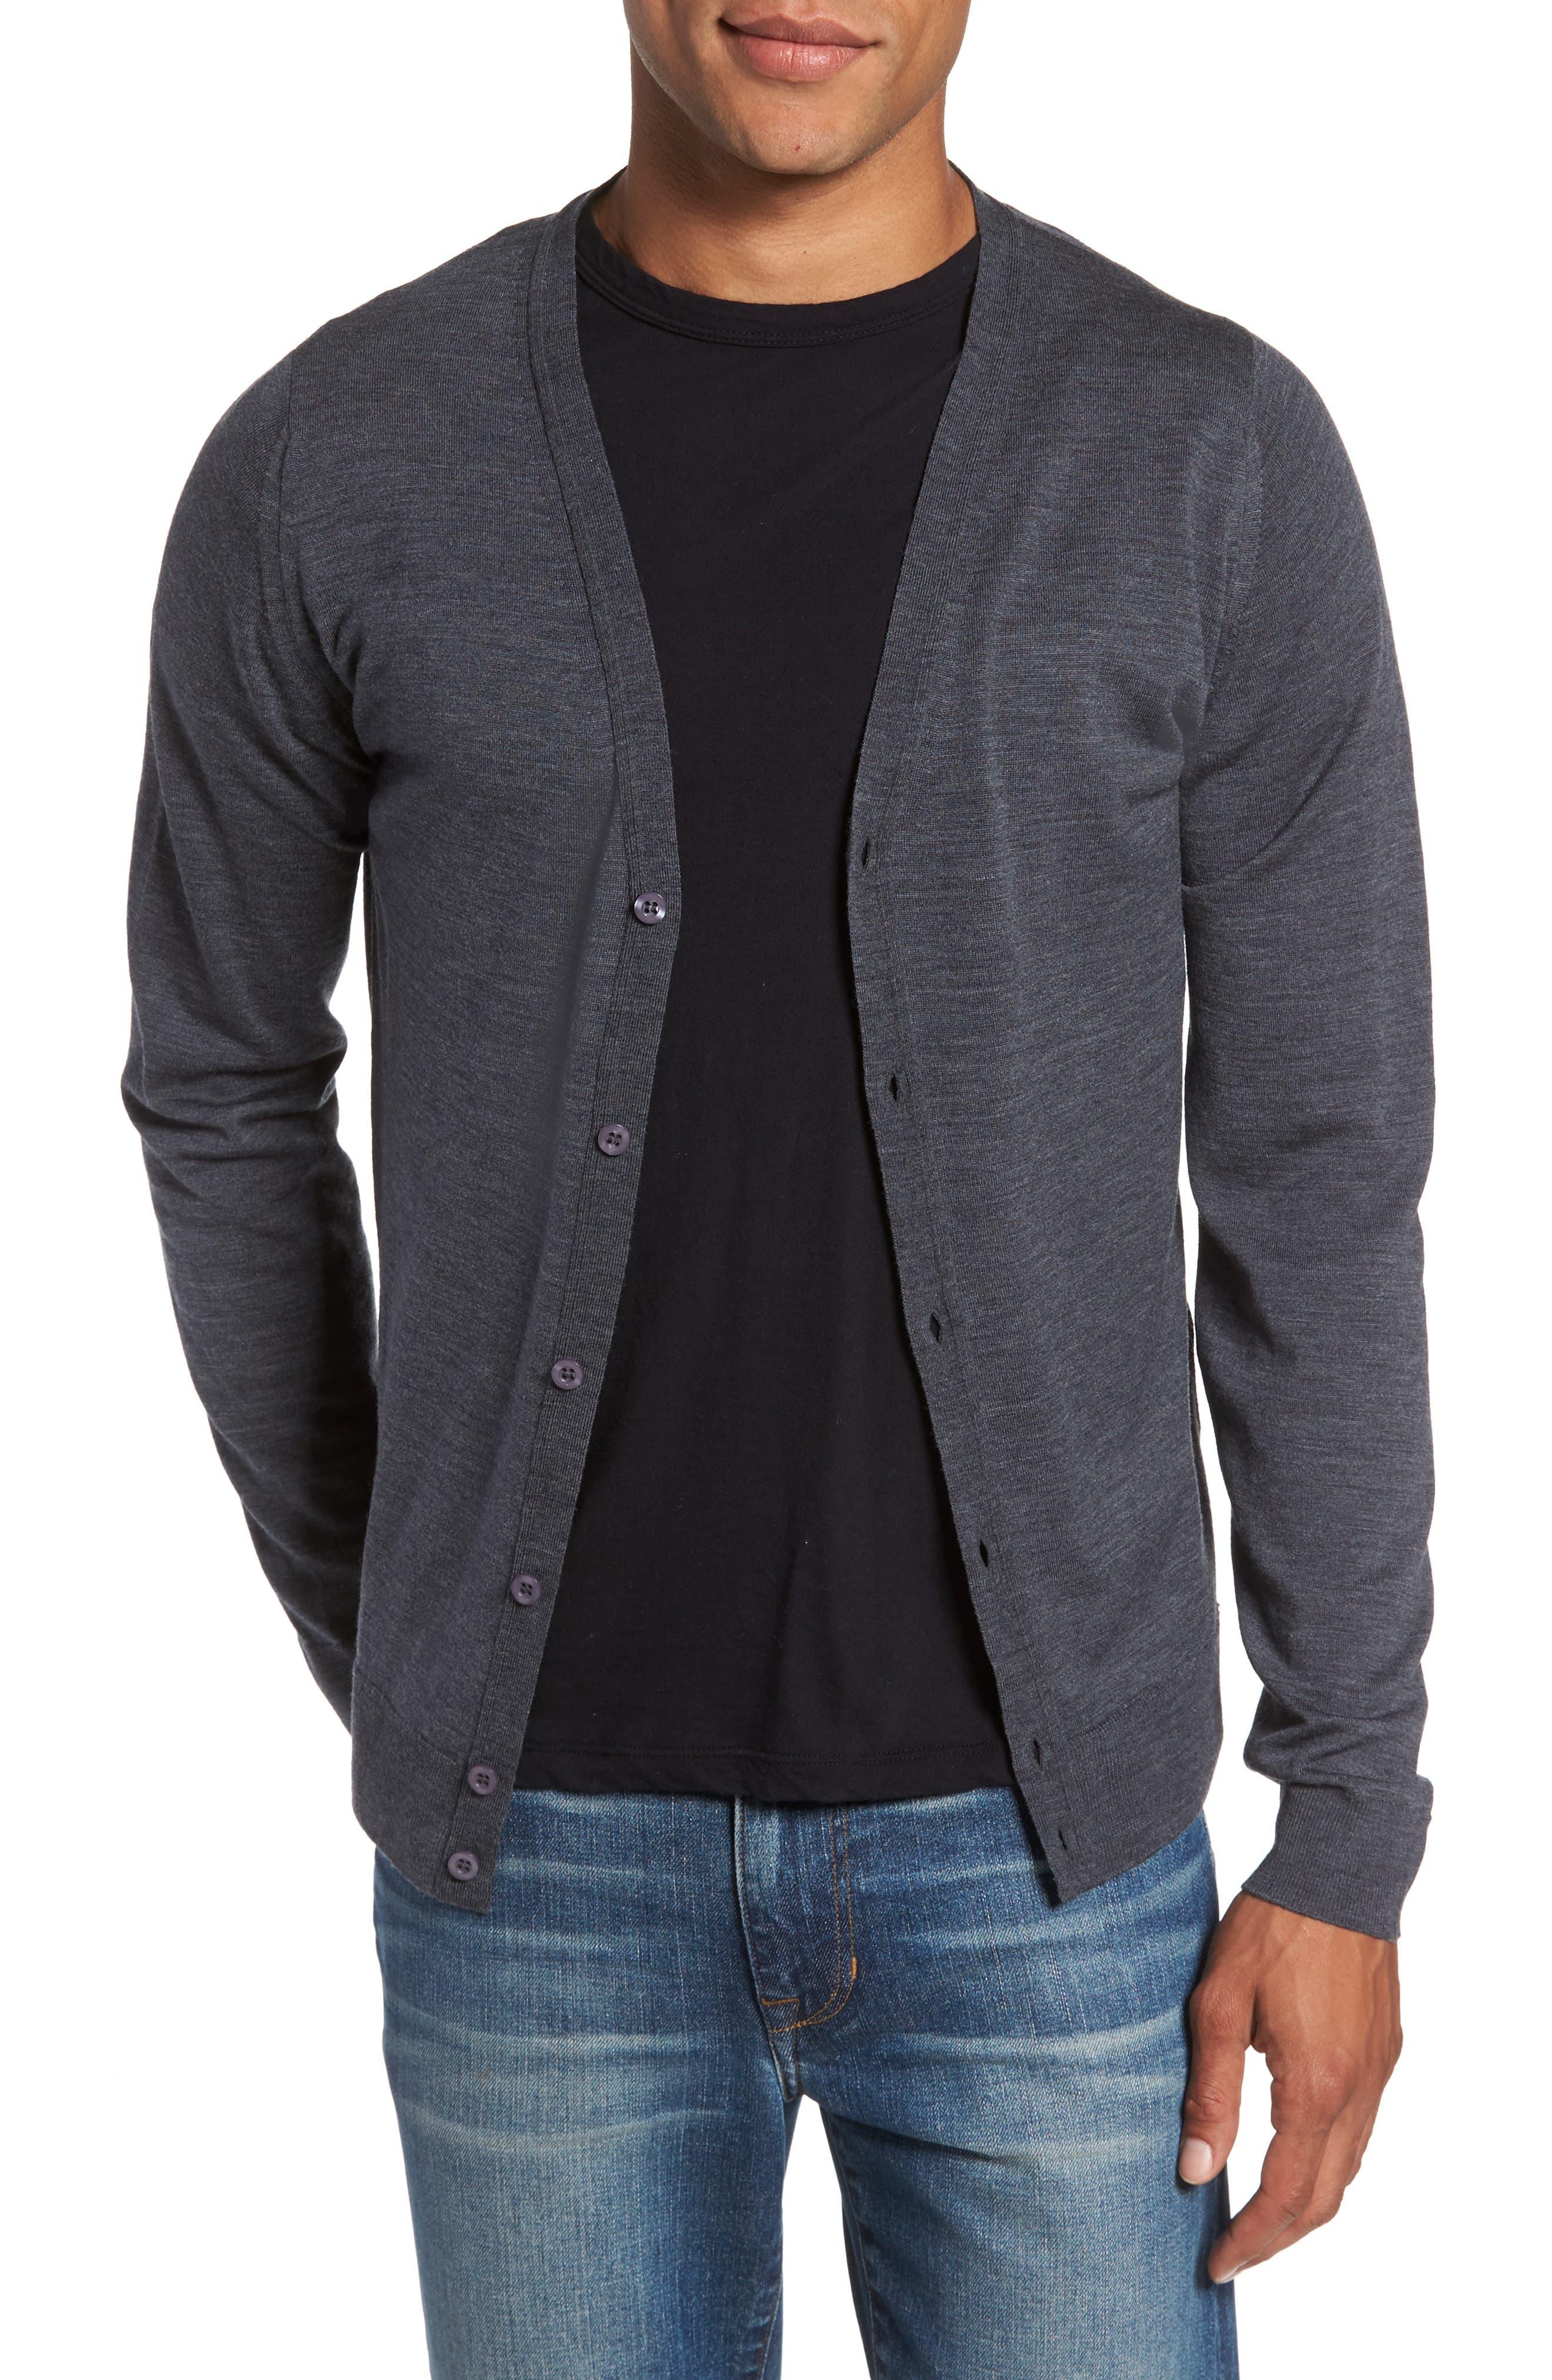 Alternate Image 1 Selected - John Smedley Standard Fit Wool Cardigan